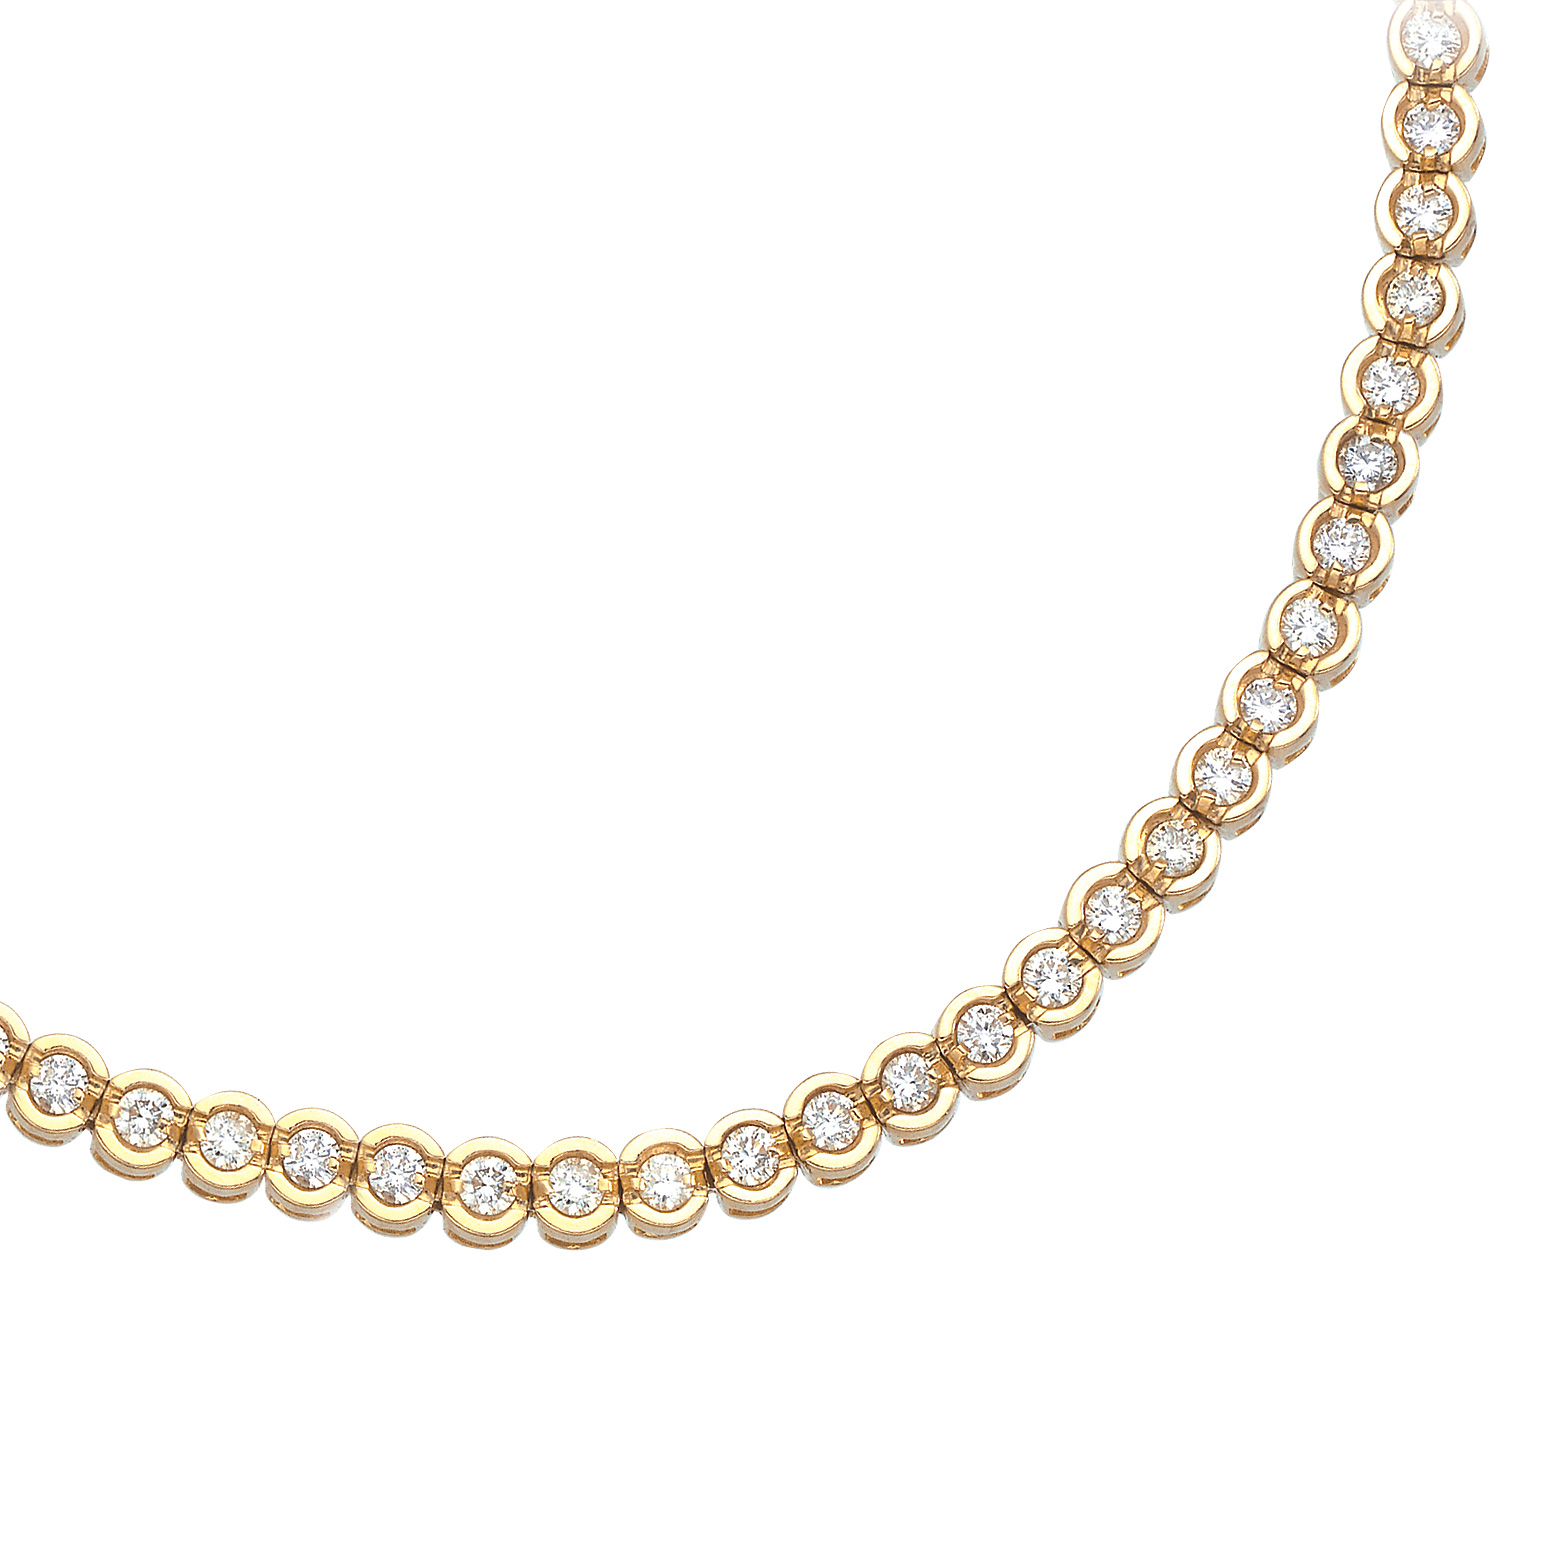 14K Yellow Gold Round Diamond Circular Style Tennis Bracelet by